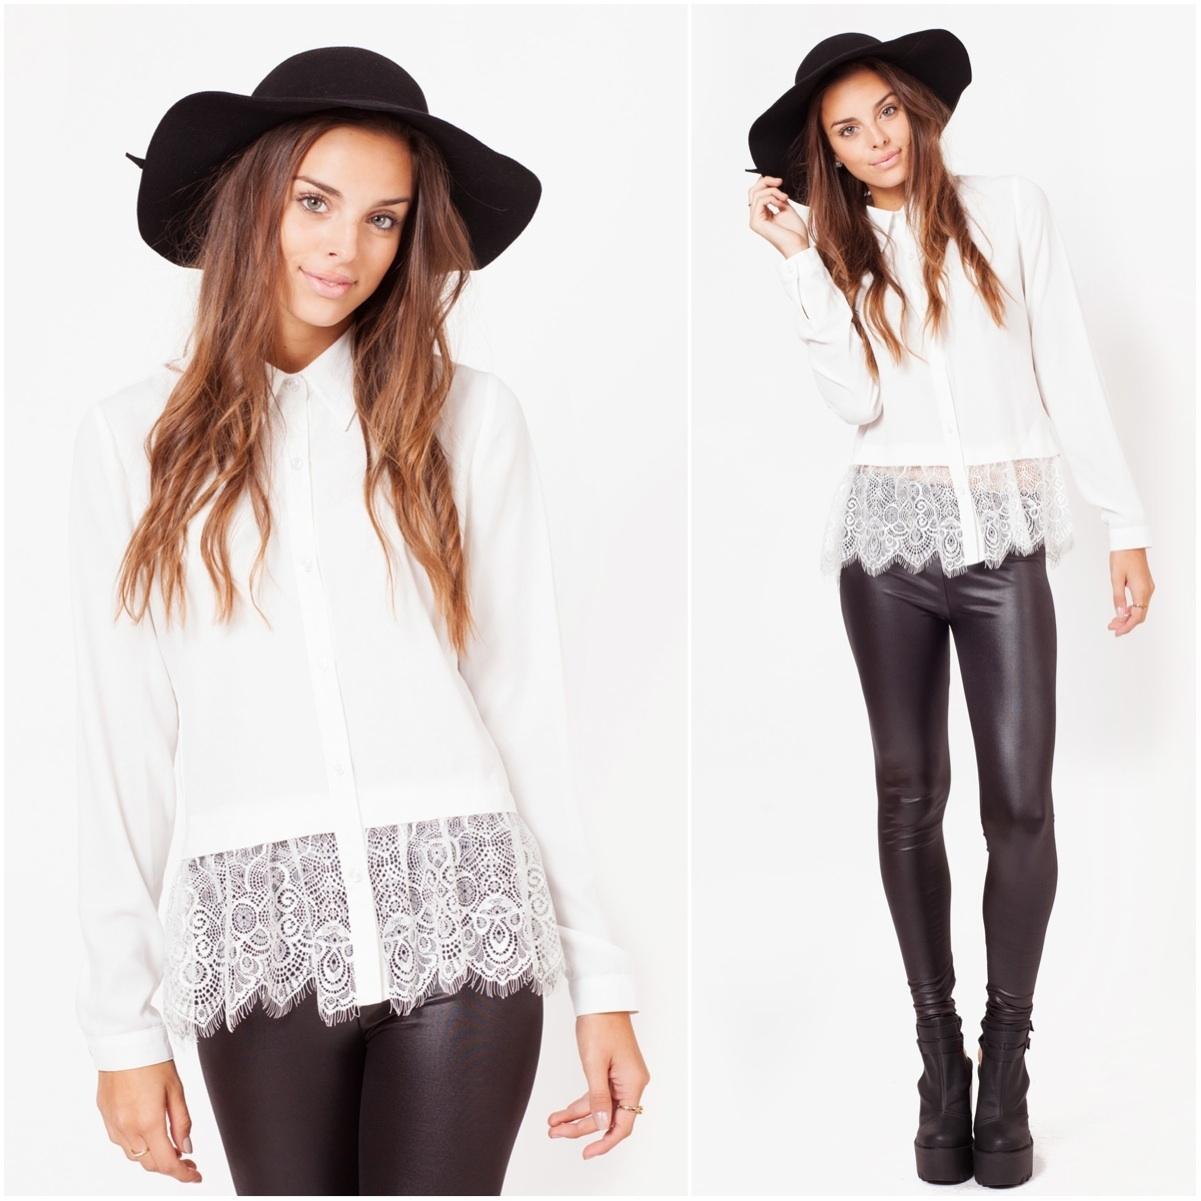 White Lace Hem Blouse £26 💛 http://t.co/6sG5V9s7WW http://t.co/vXvNbuiiIC